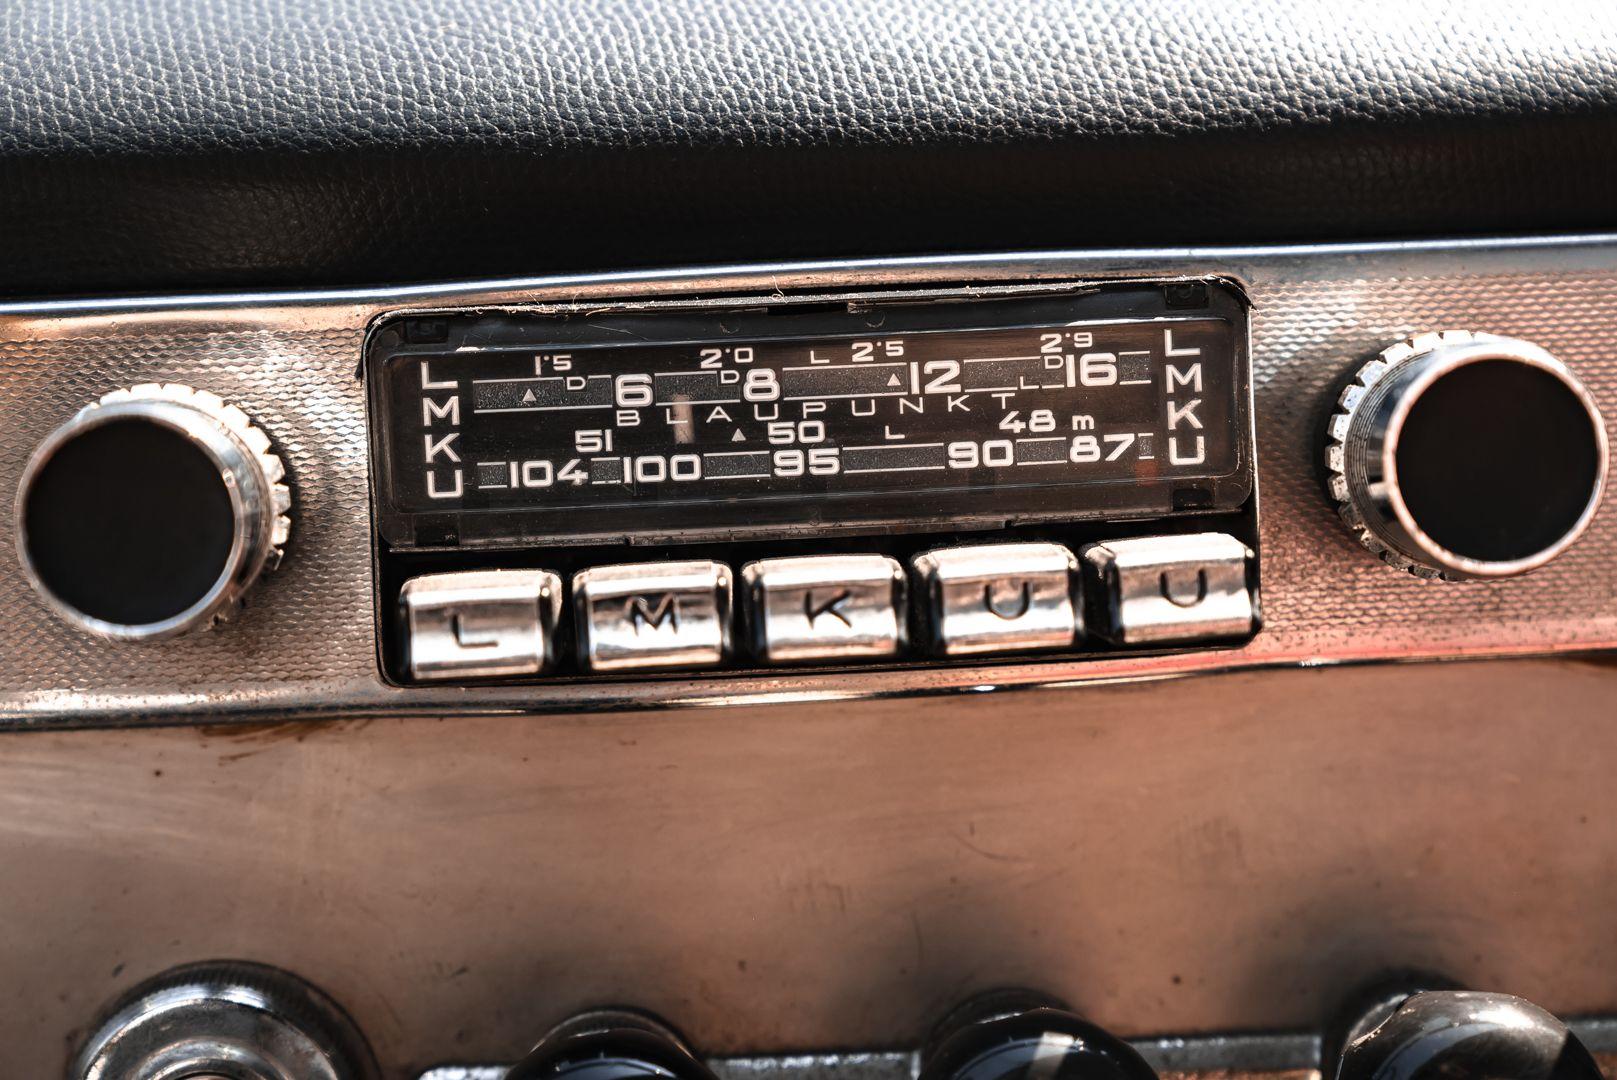 1963 Lancia Flaminia Touring Convertible 2500 3C  73177